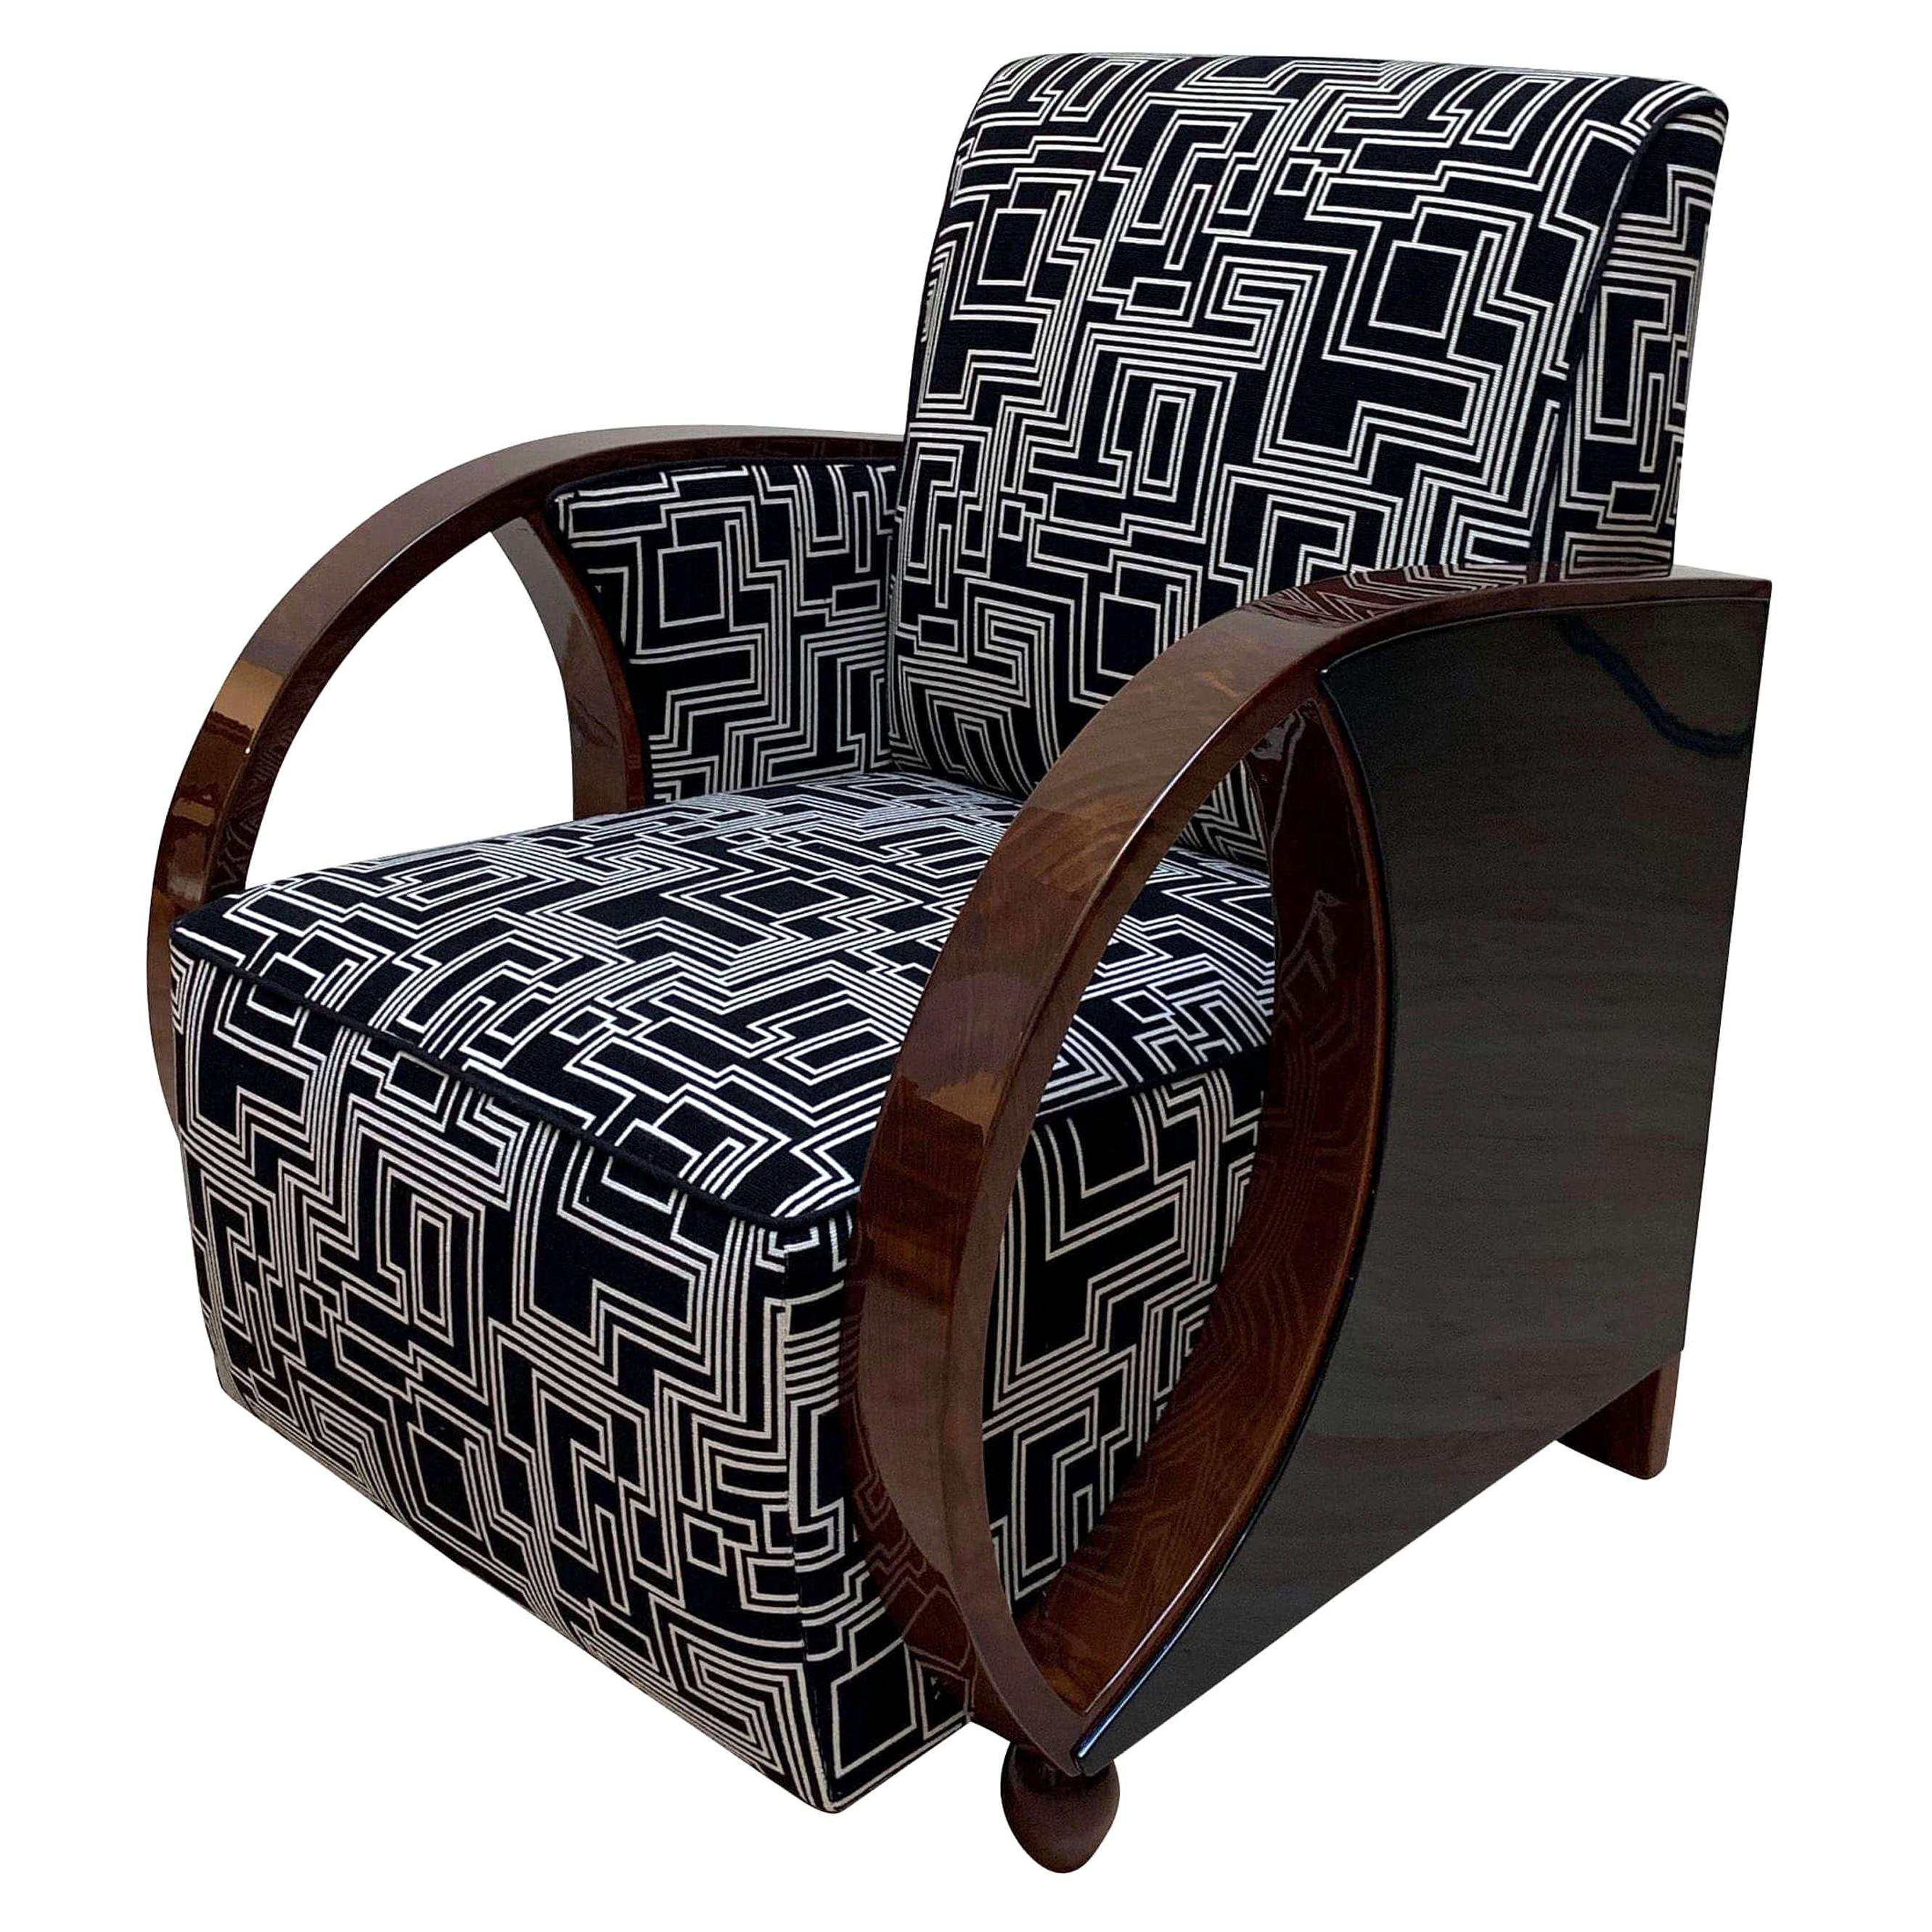 Art Deco Club Chairs, Walnut and Black Lacquer, France, circa 1930